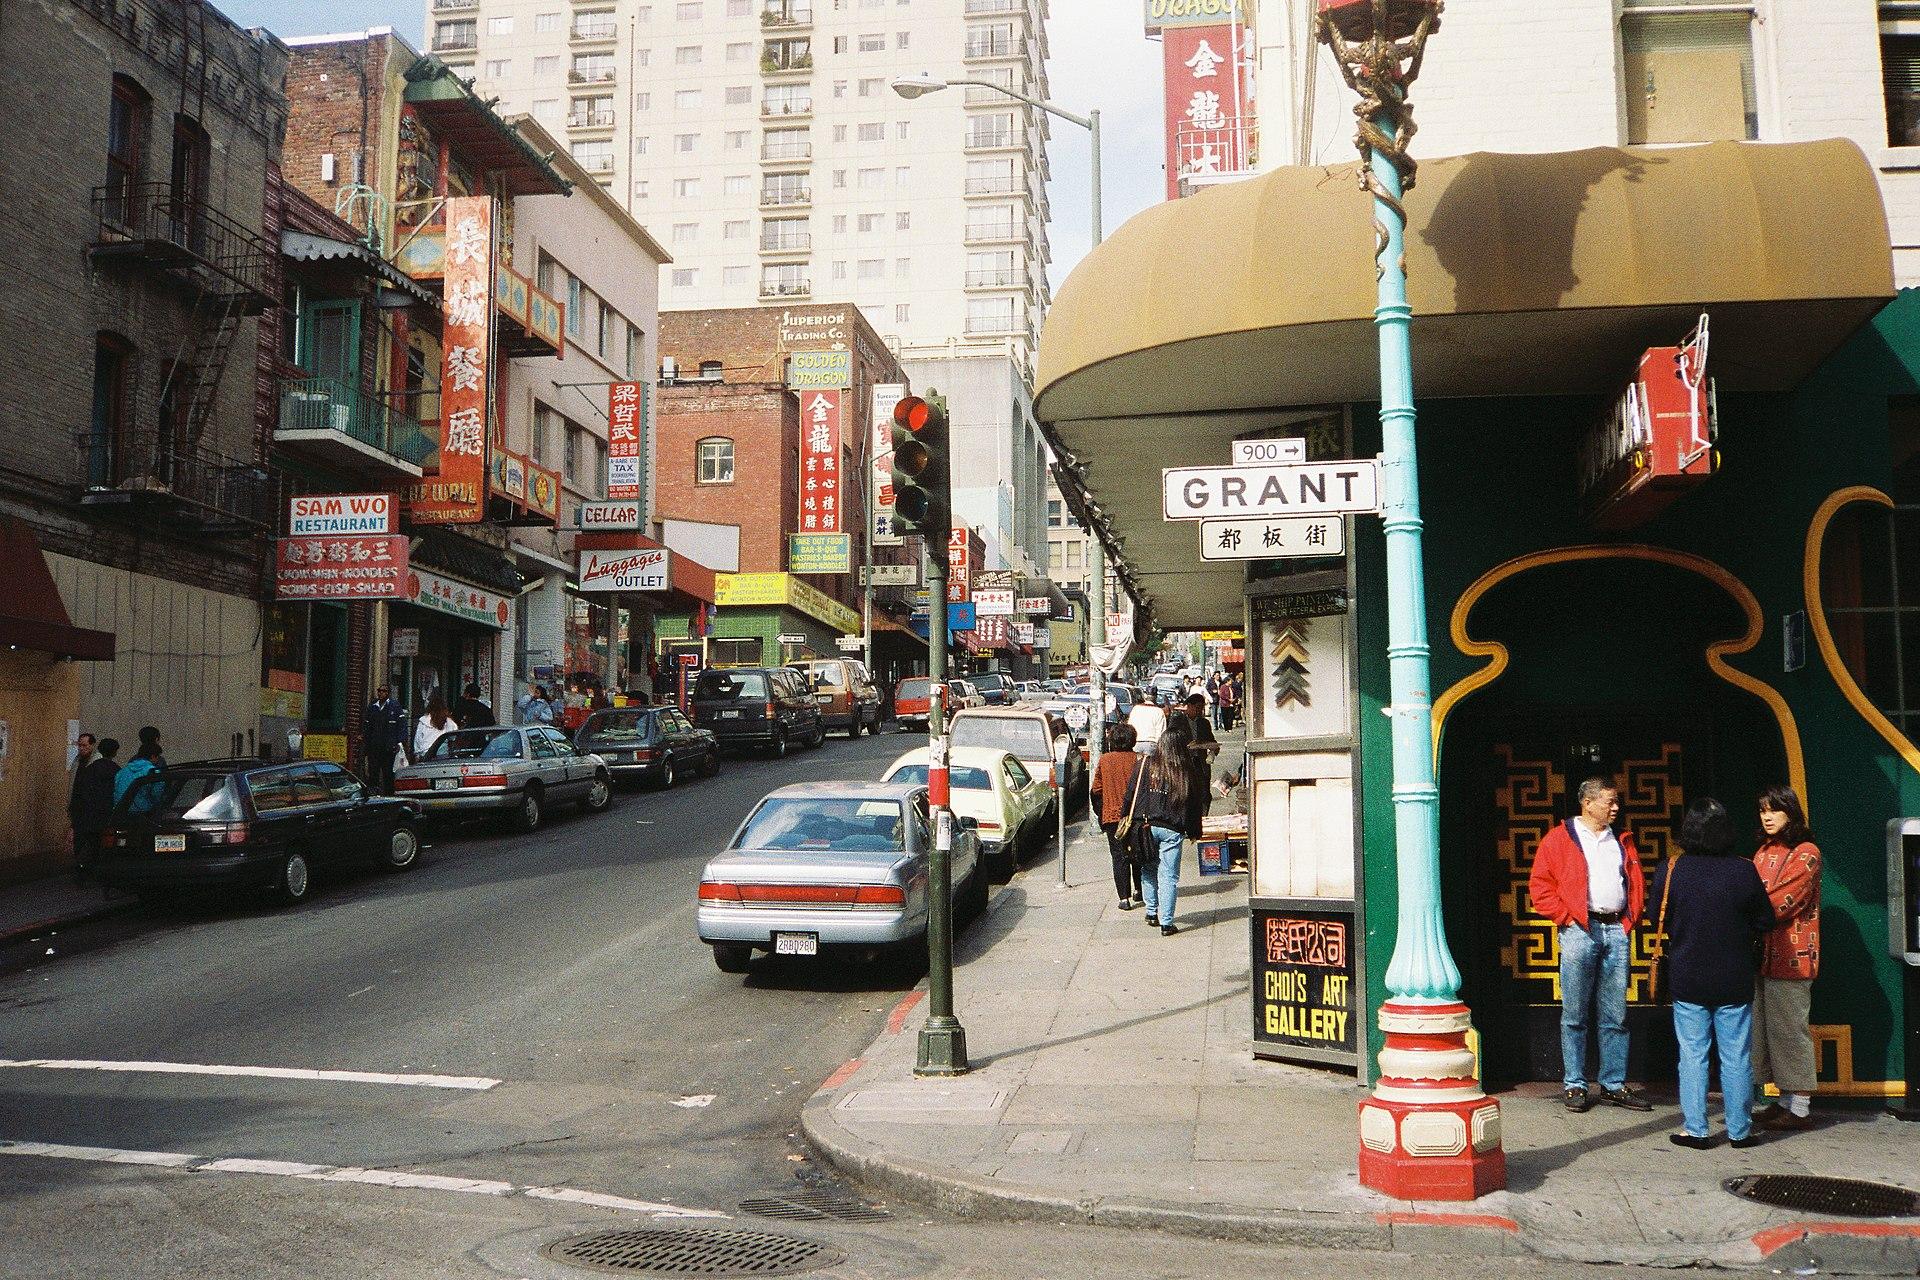 Ching S Restaurant Braised Pork Soy Aubergine